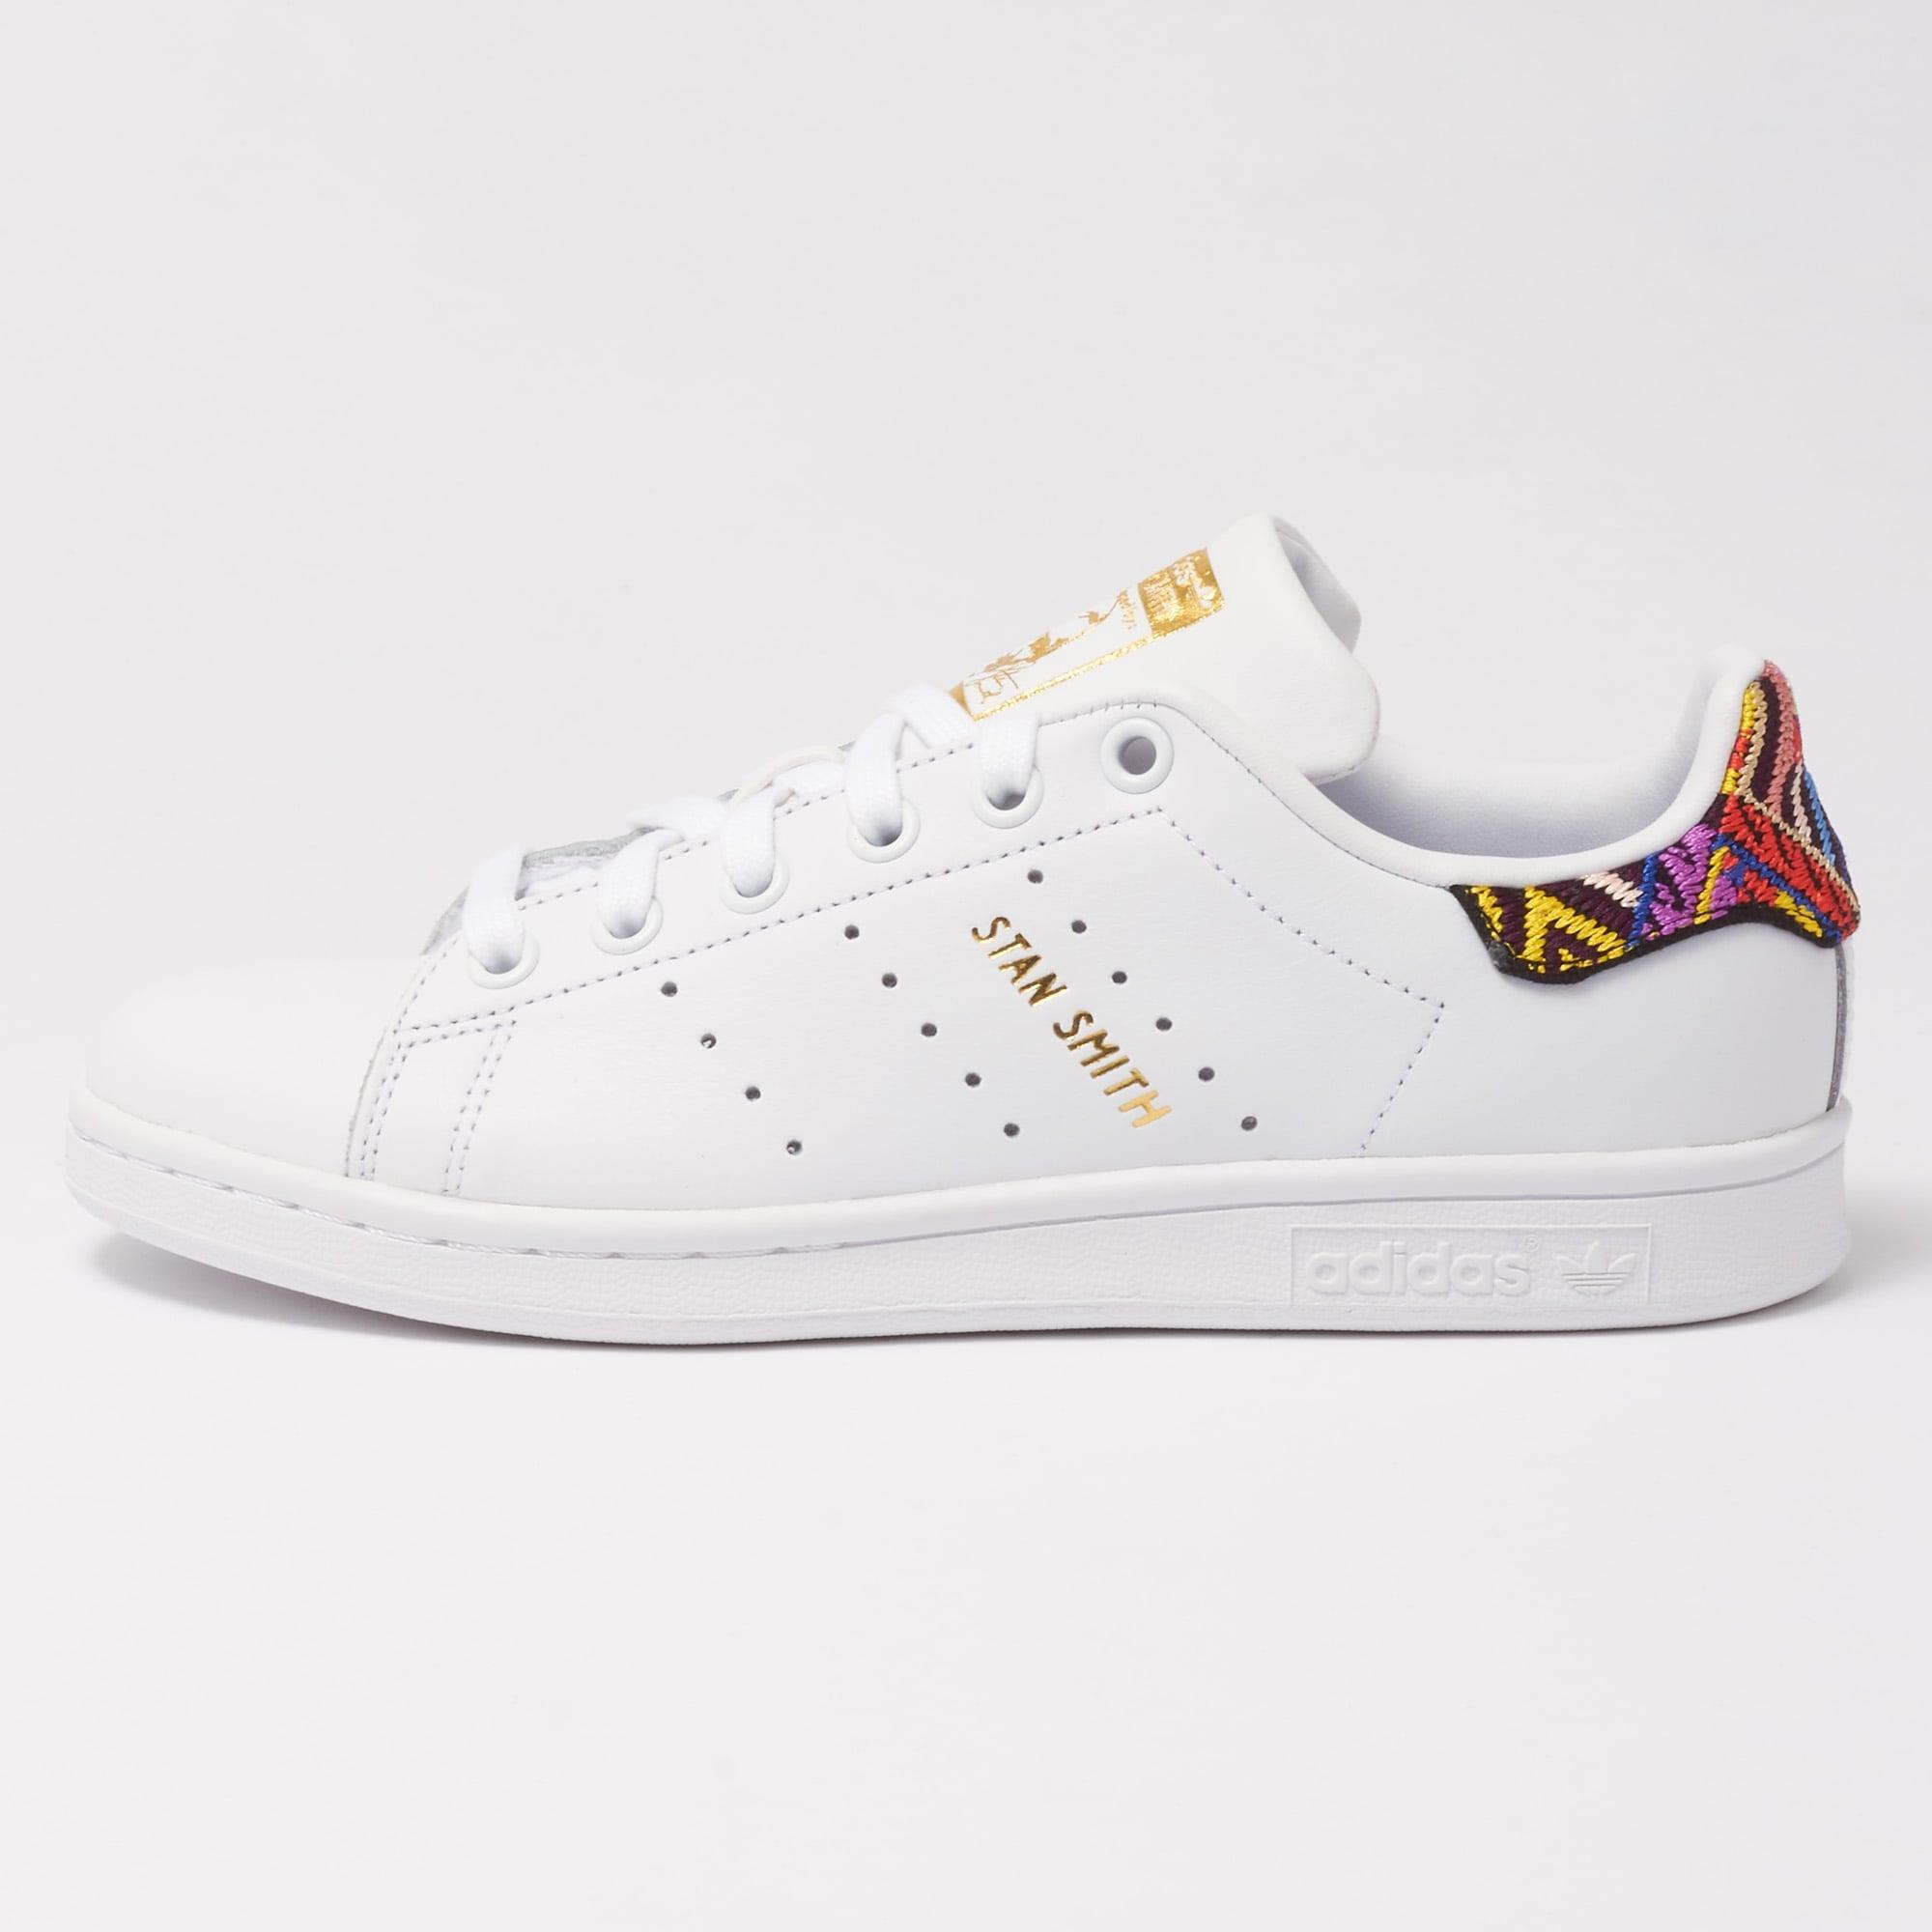 6d7e691a22e Adidas x The FARM Company Stan Smith Sneakers (White) at Dandy Fellow